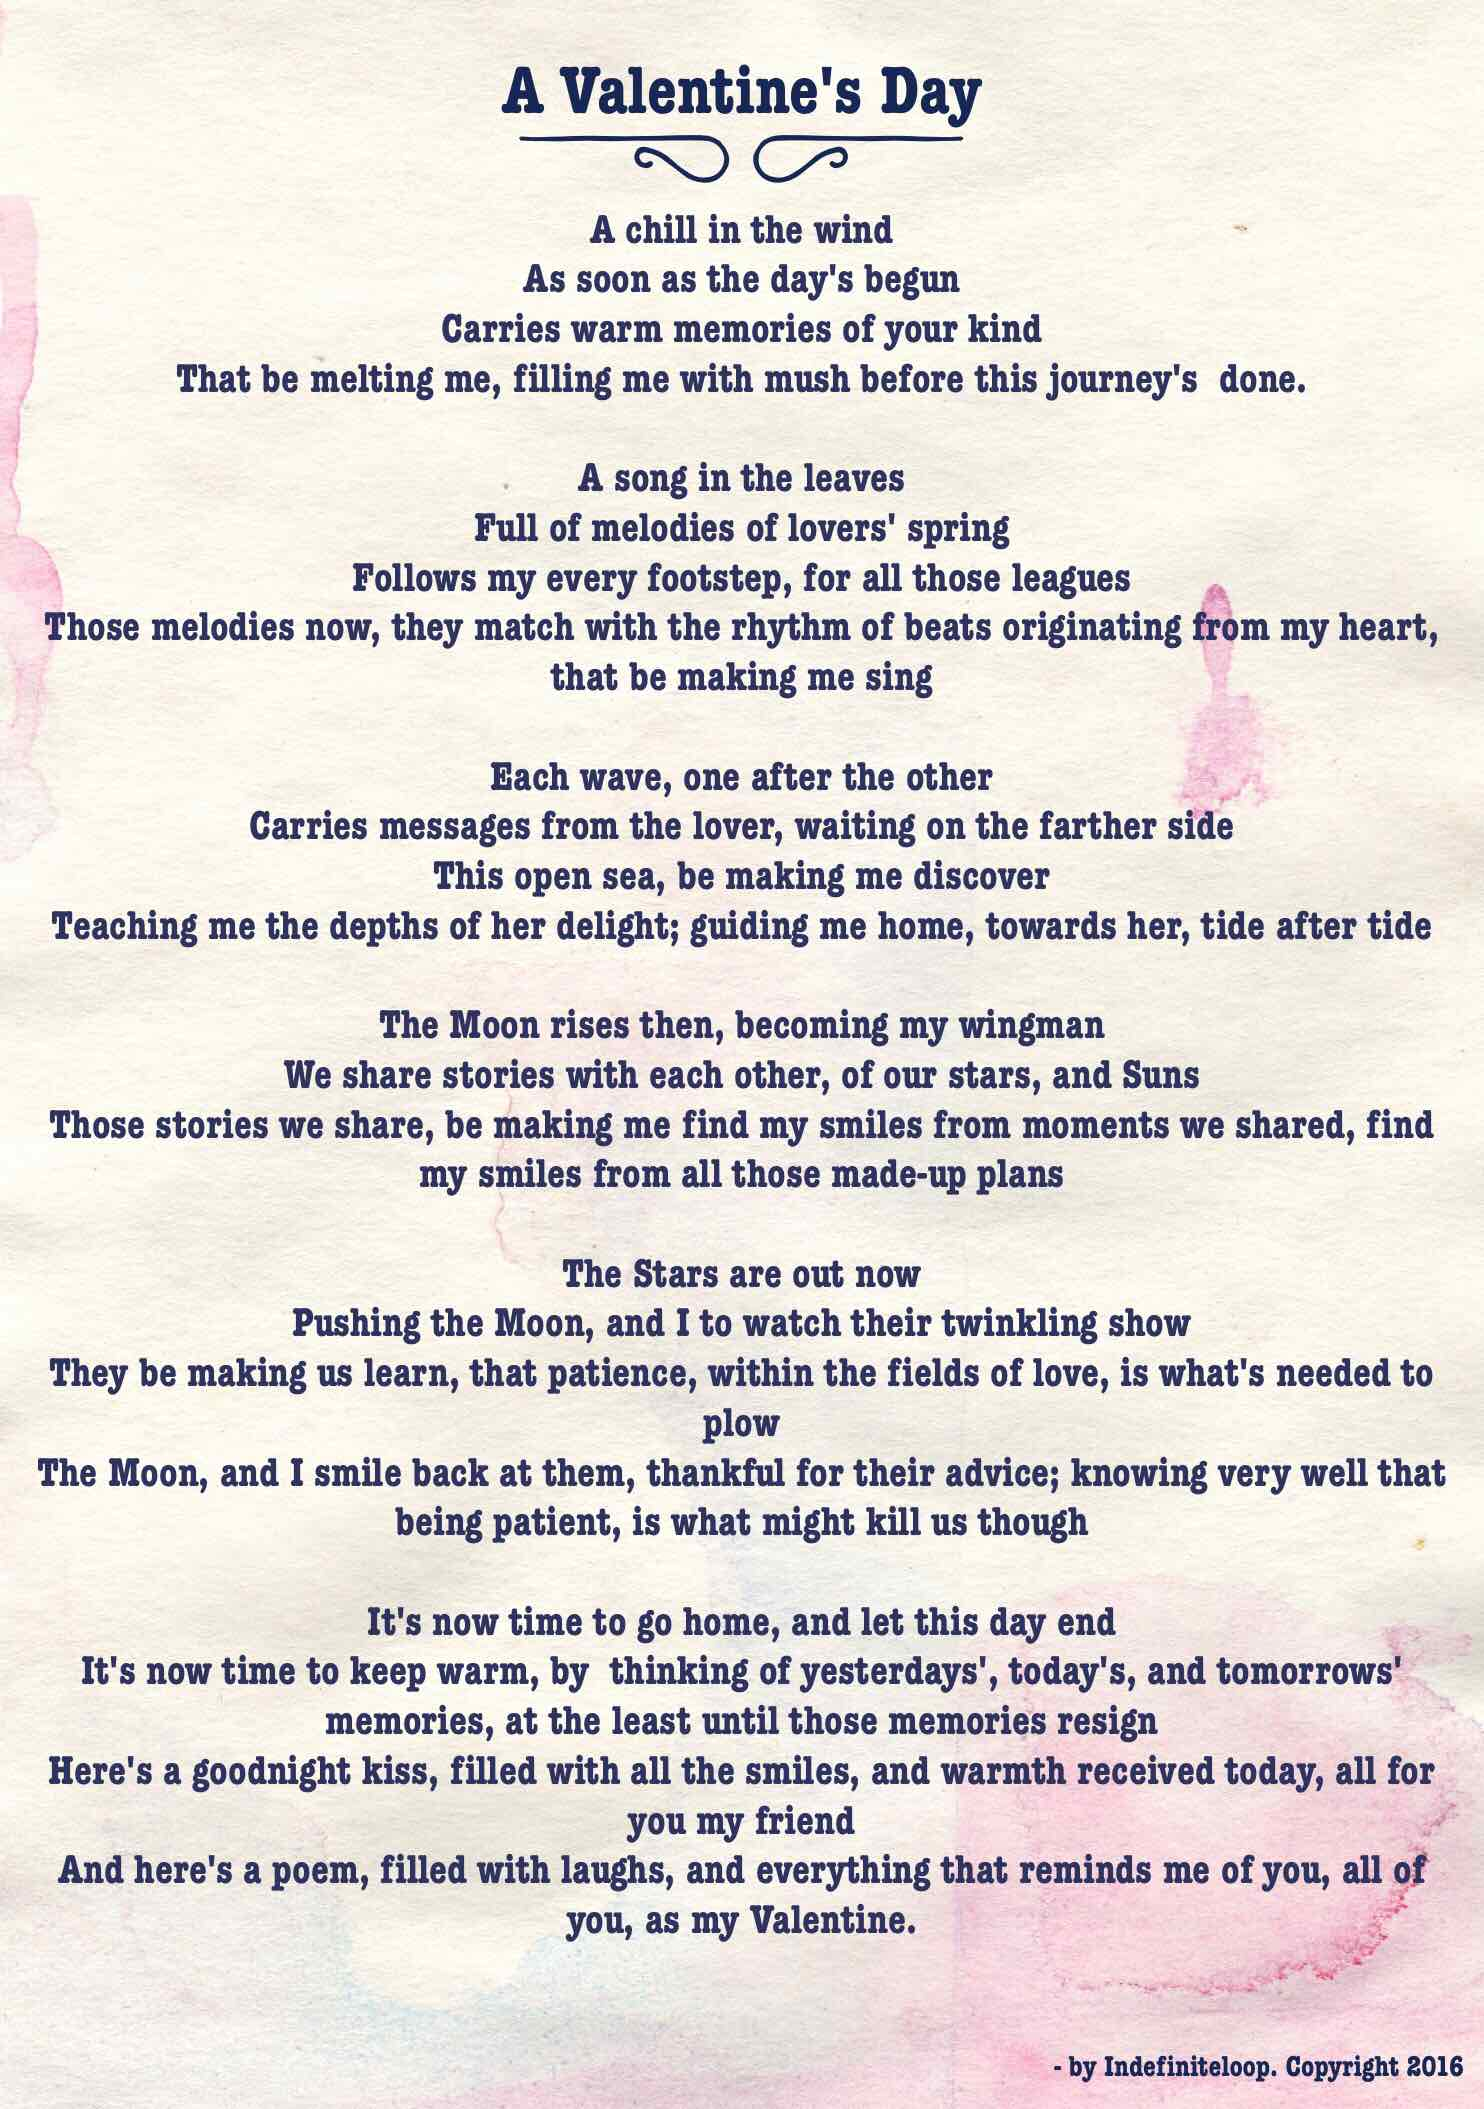 A Valentine's Day - Poem - Copyright indefiniteloop.com